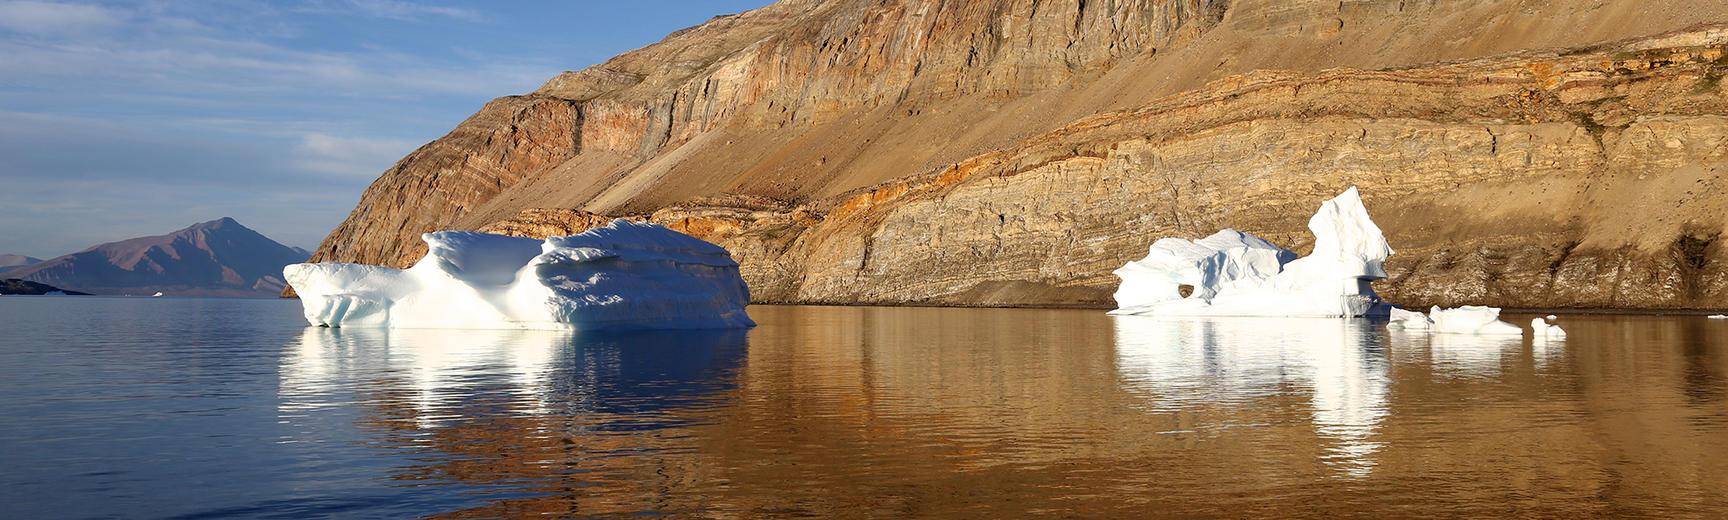 Lower Cambrian of Ella Ø, North-East Greenland